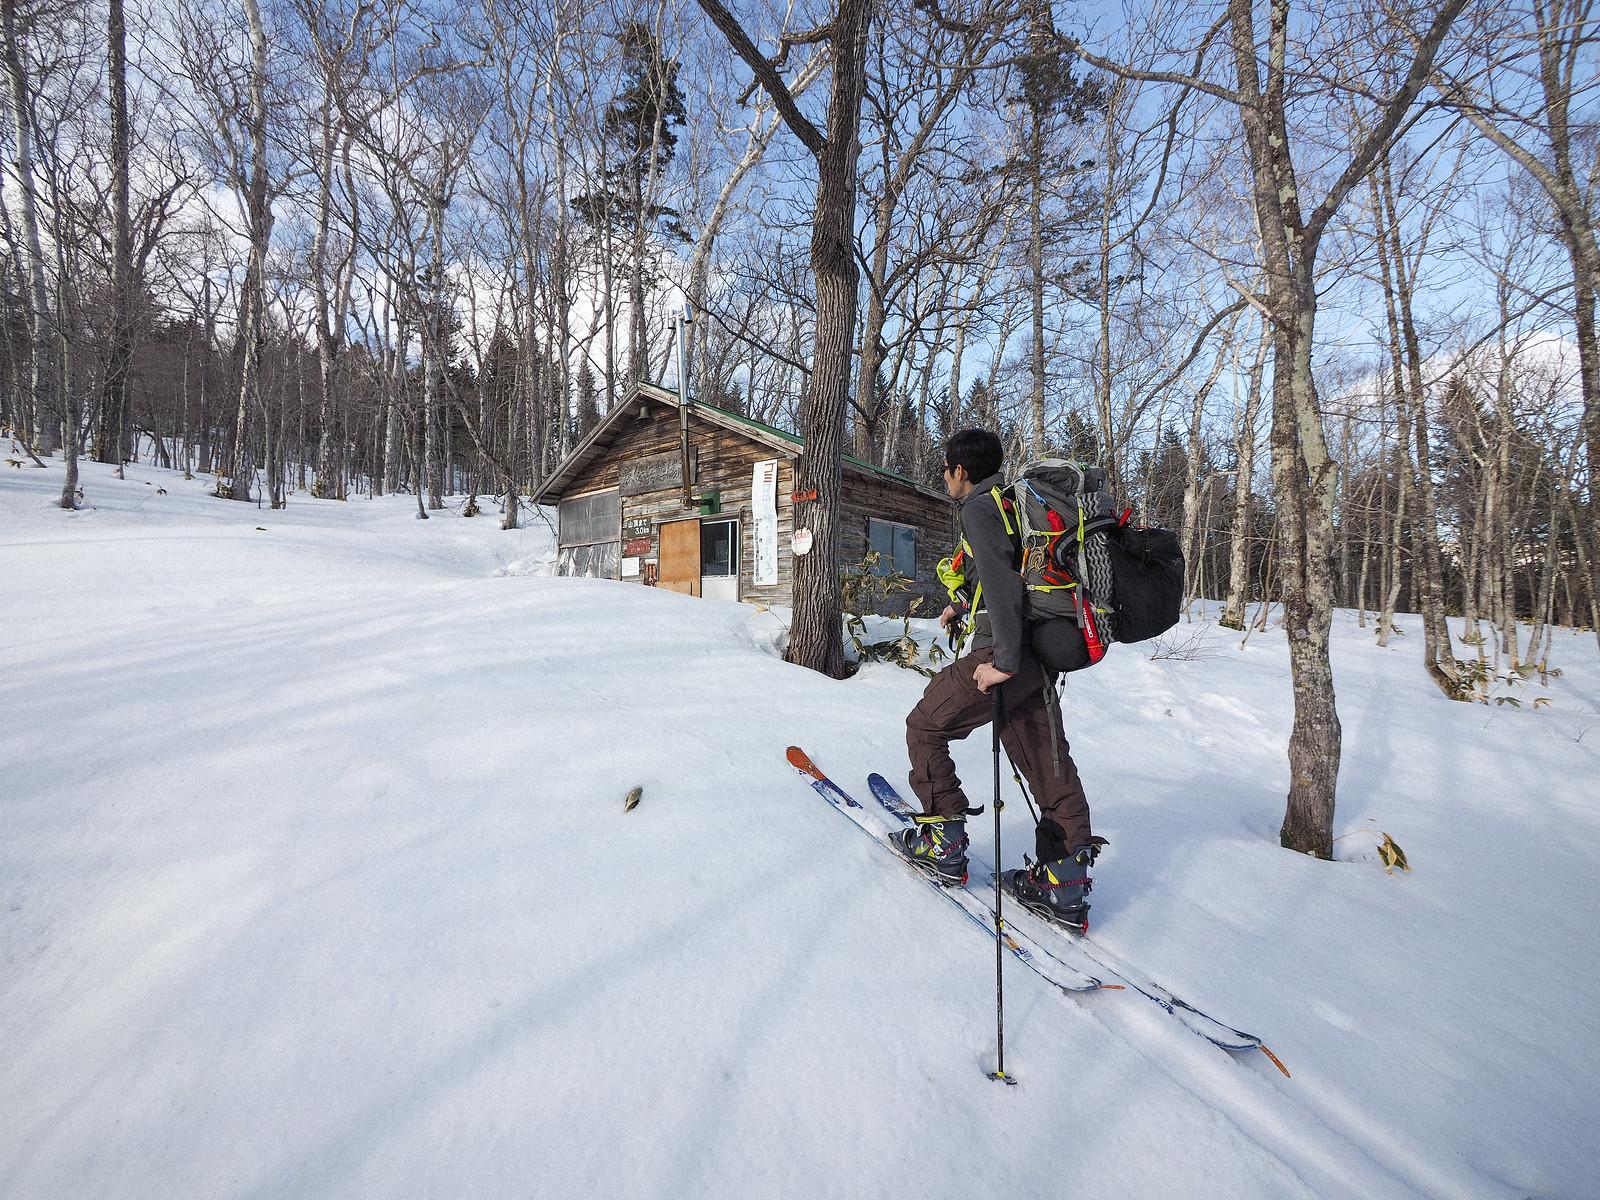 Mt. Musa and Mt. Musa Hut ski touring (Hokkaido, Japan)